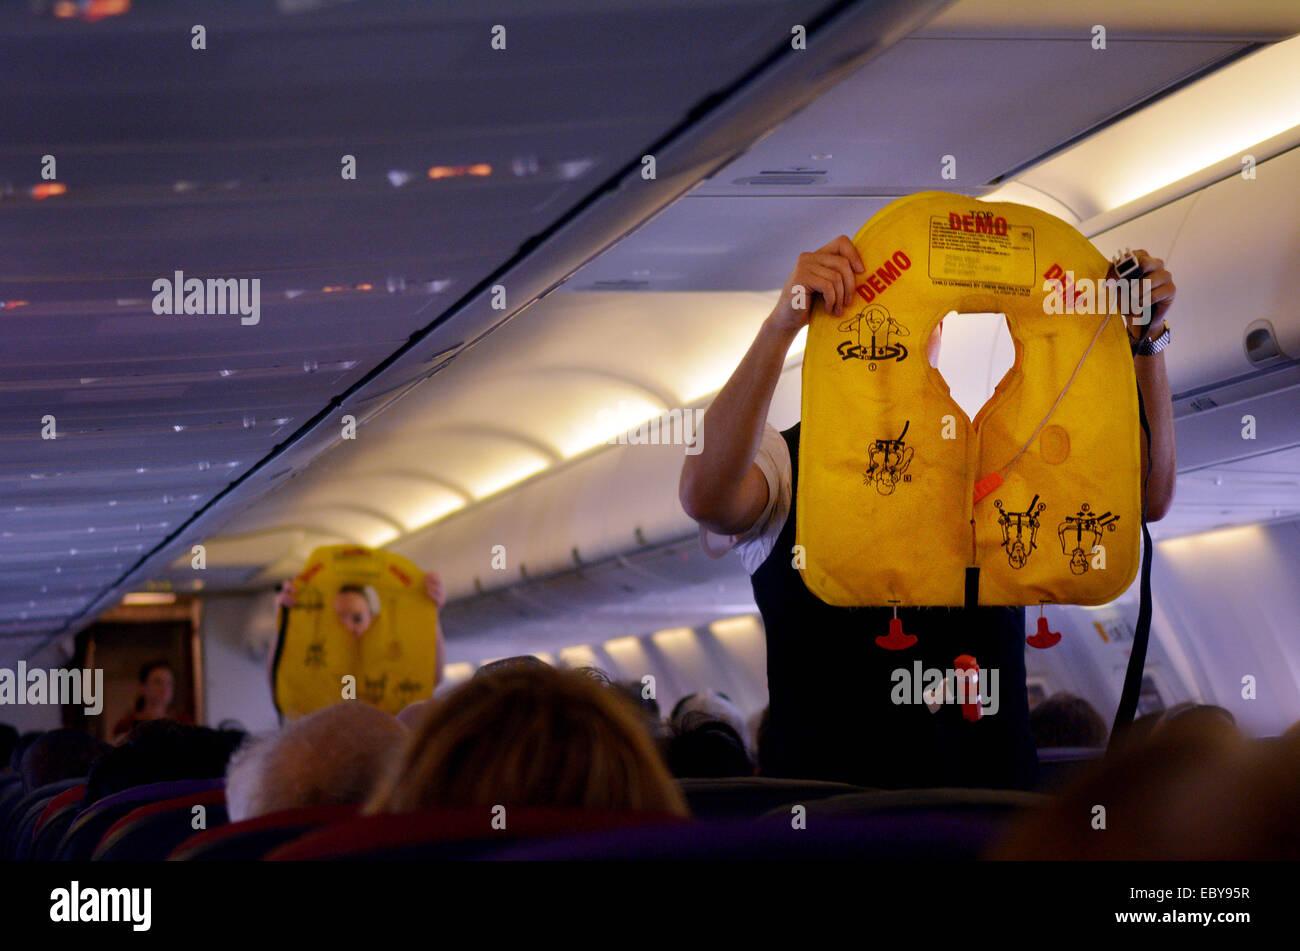 GOLD COAST, AUS - NOV 22 2014:Flight attendants during Pre-flight safety demonstration. - Stock Image